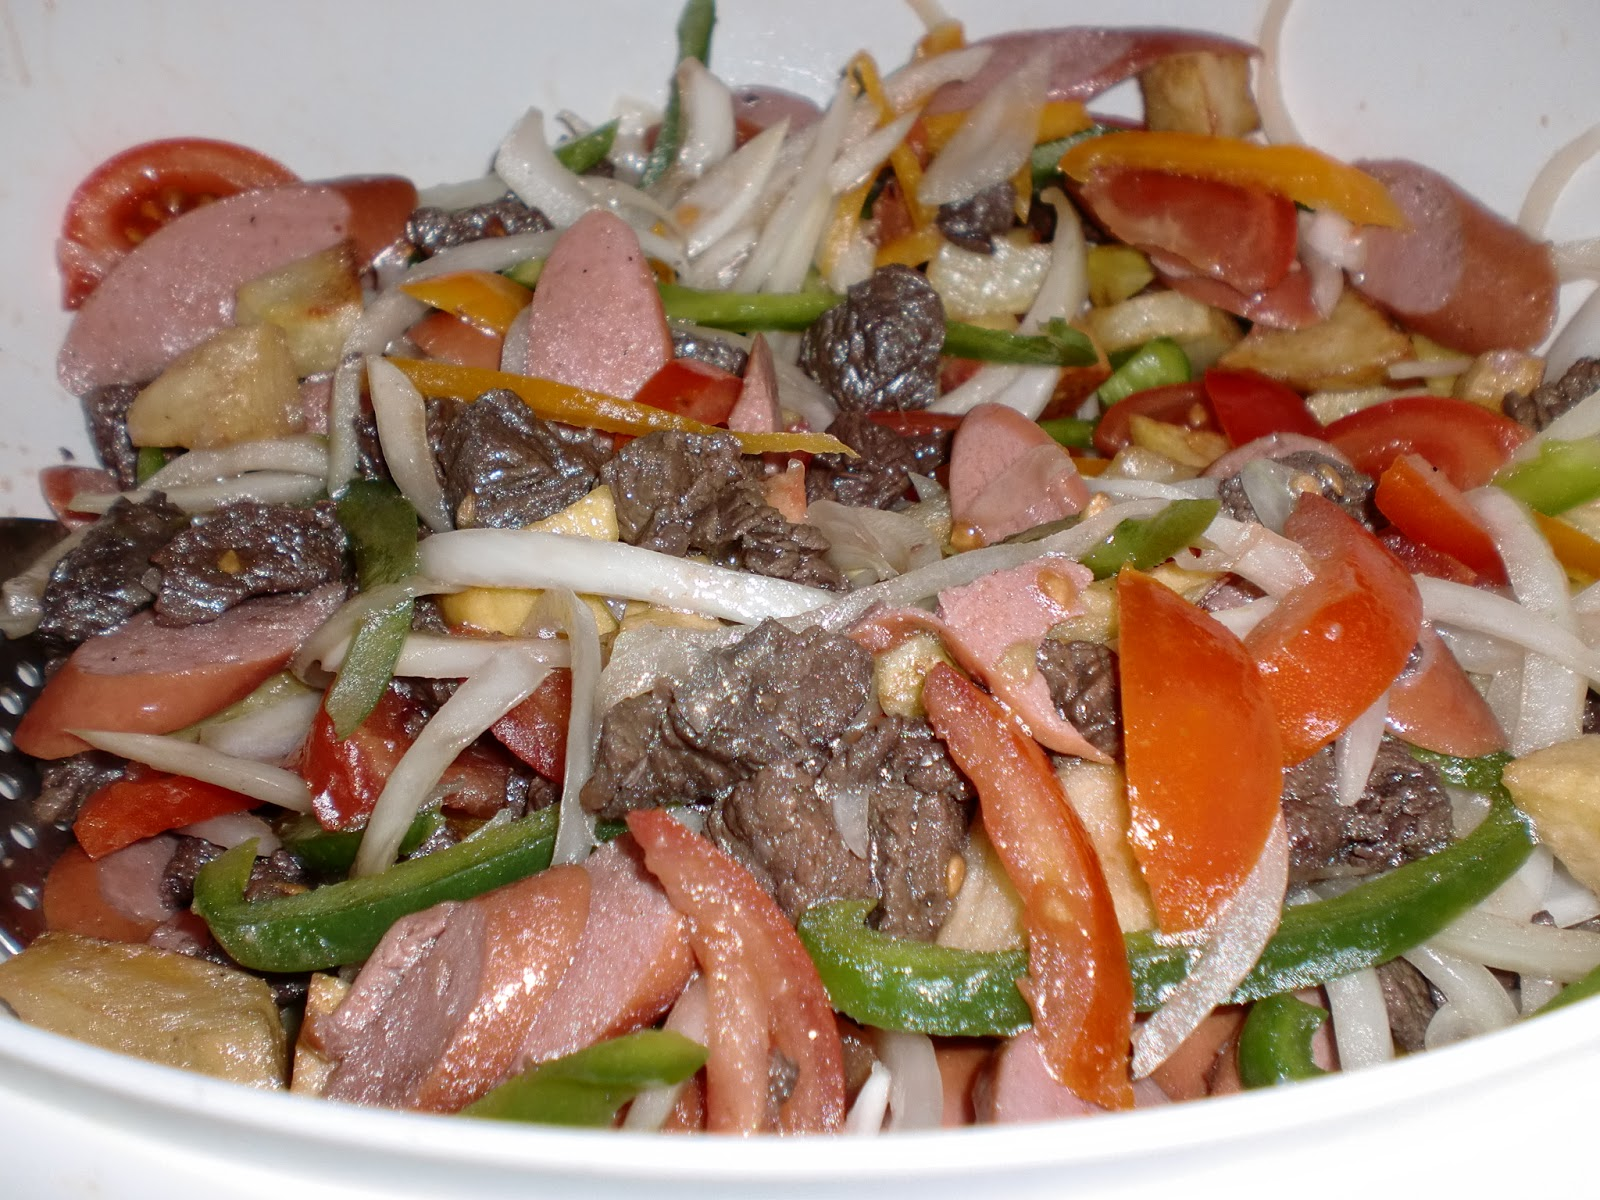 Cocina boliviana pique macho for Ingredientes para comida